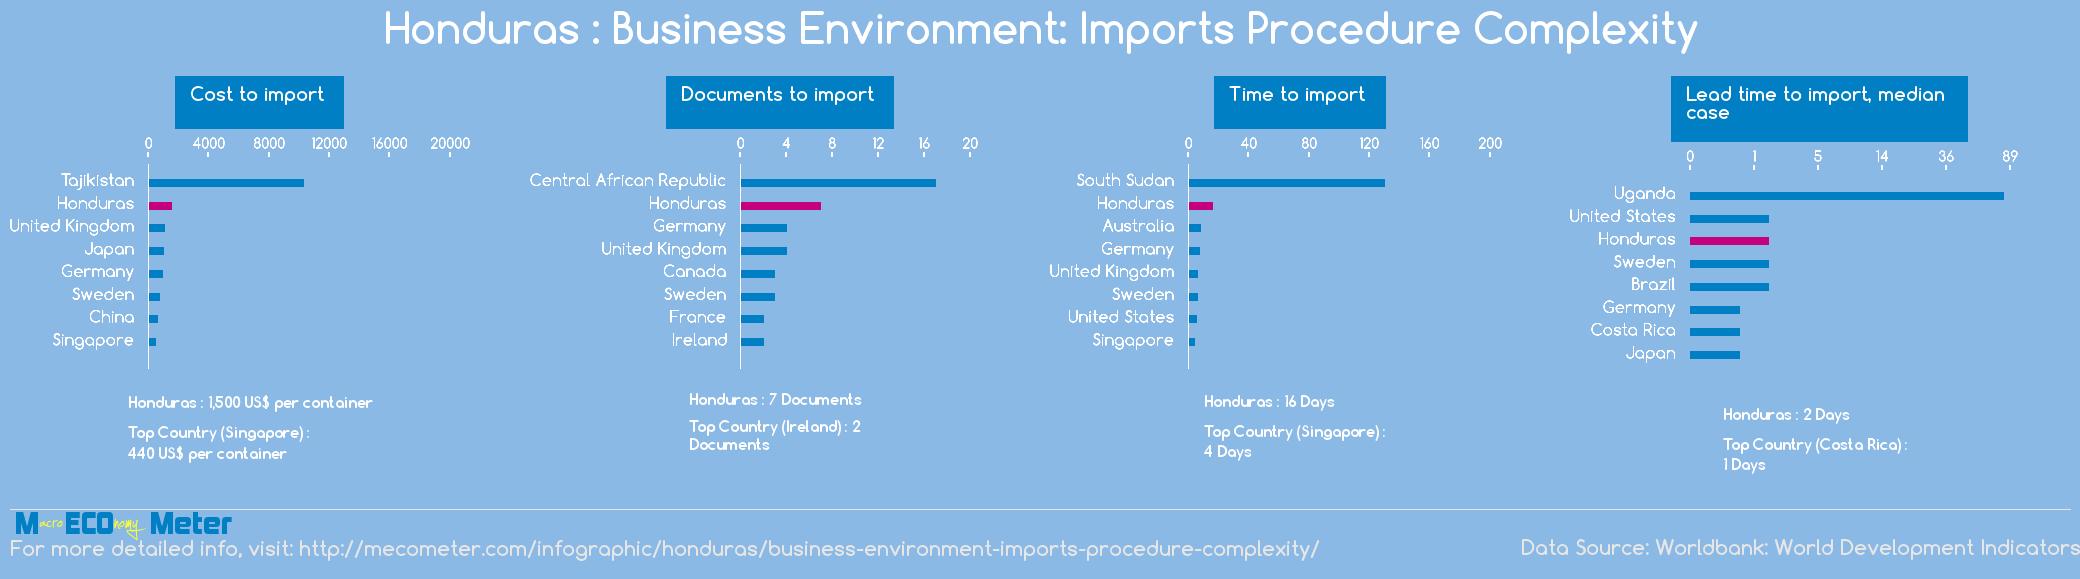 Honduras : Business Environment: Imports Procedure Complexity